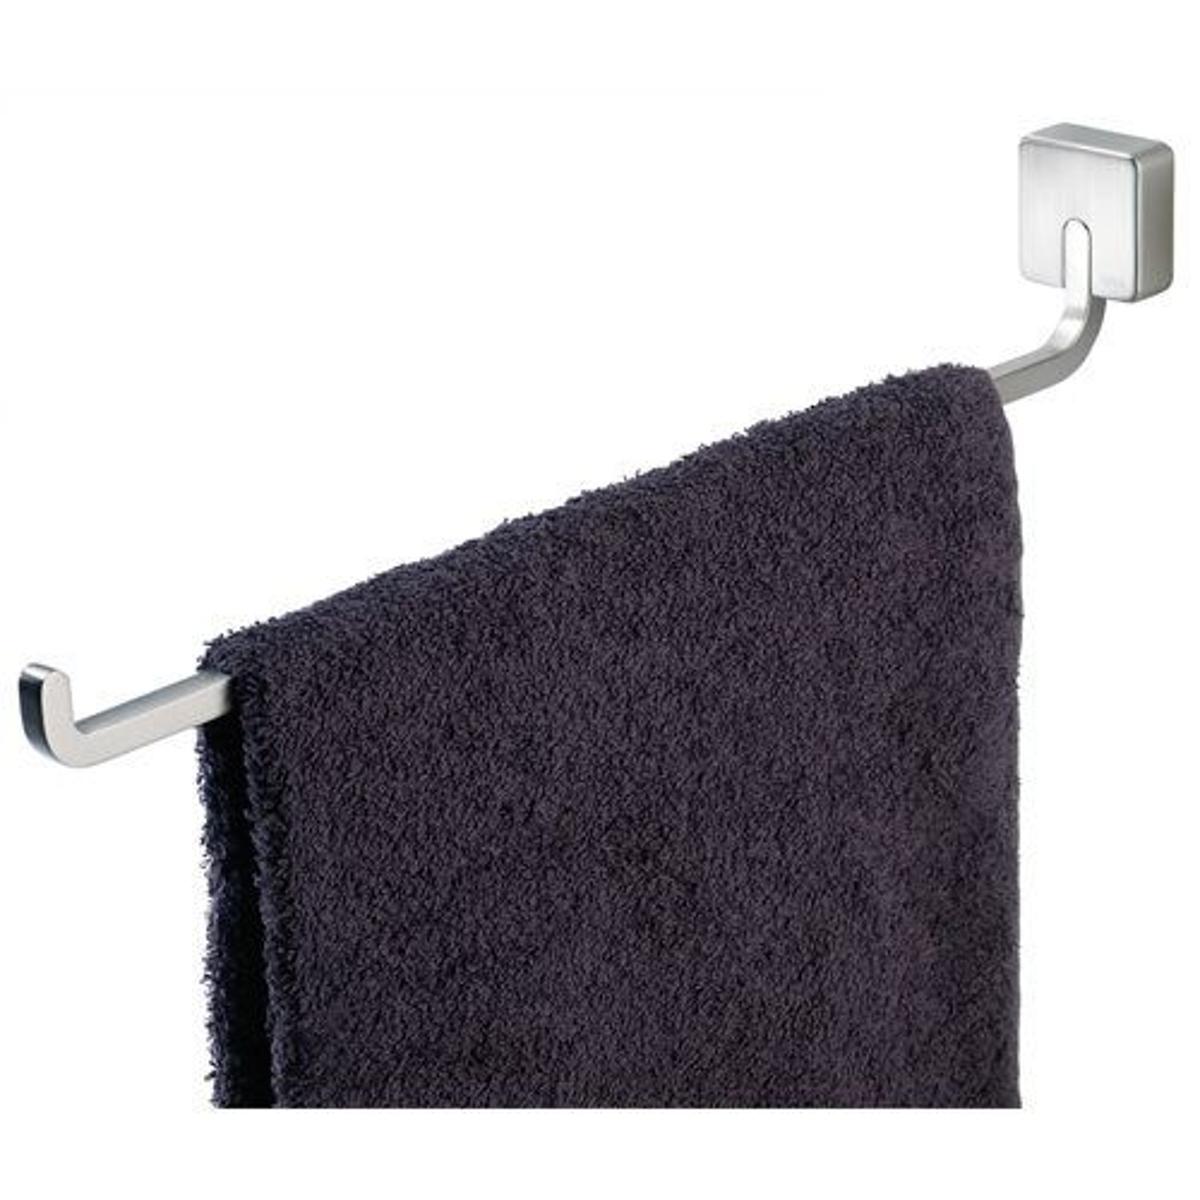 Porte-serviettes Tiger Impuls mat- Acier inoxydable